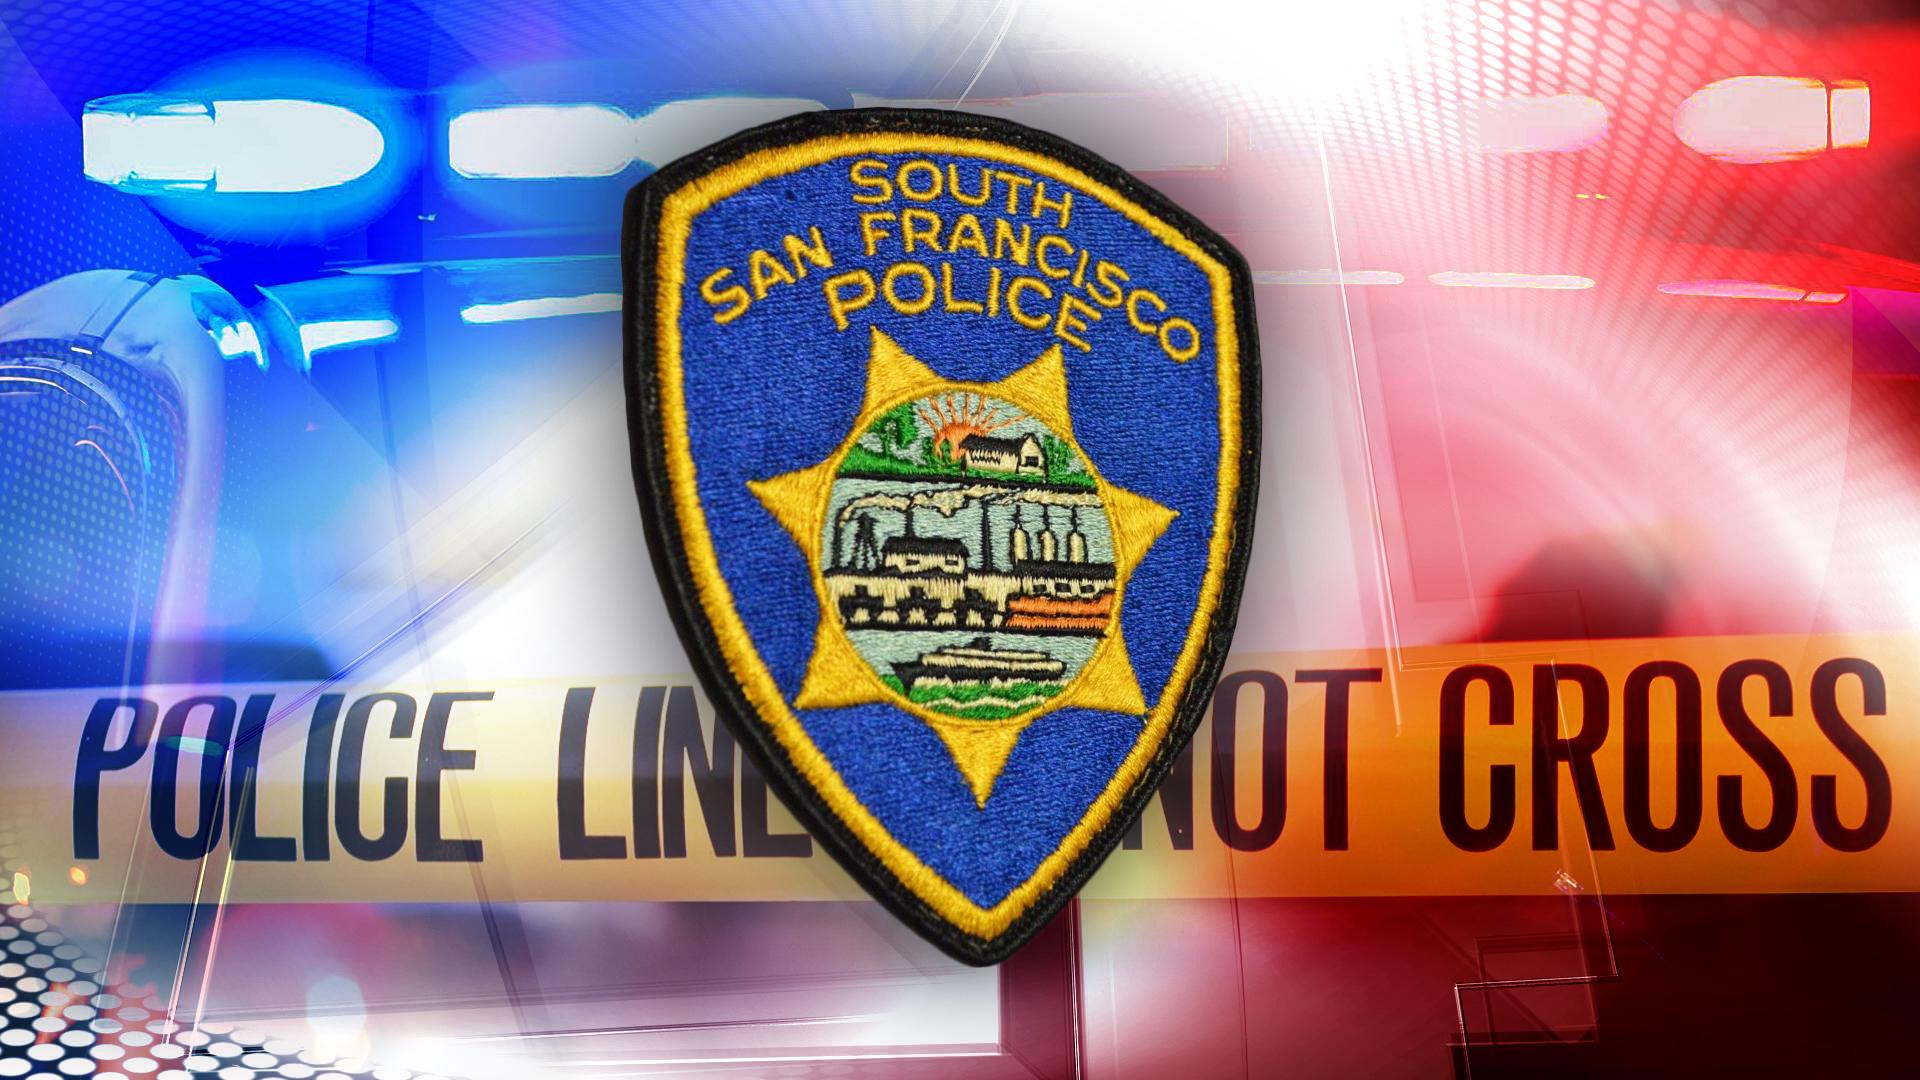 graphic FS Police South San Francisco_1523153154291.jpg.jpg